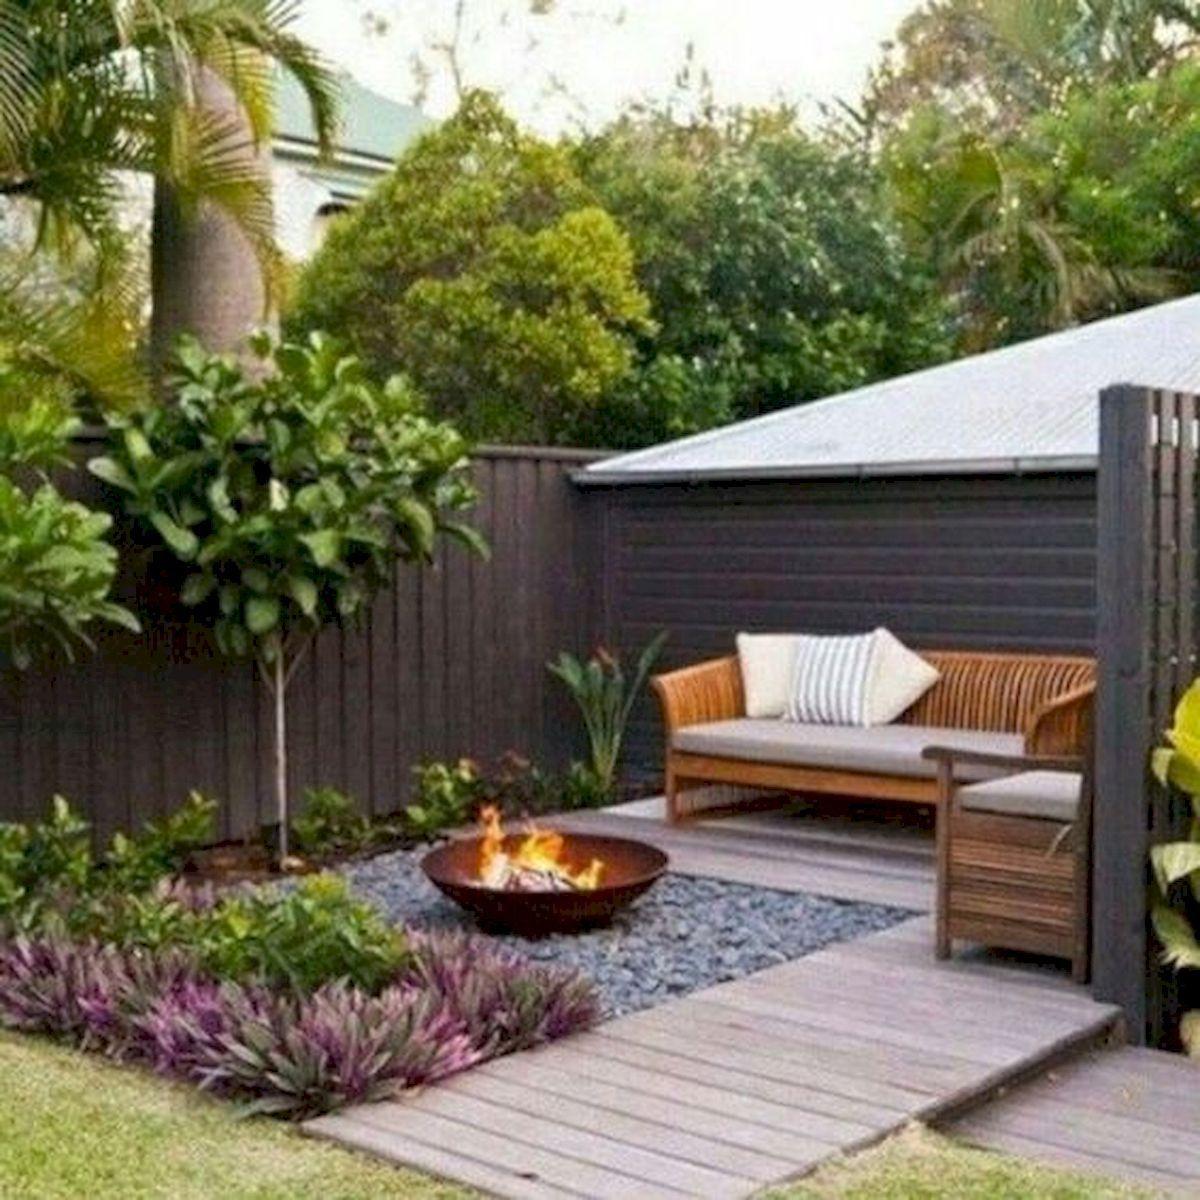 44 Amazing Backyard Seating Ideas To Make You Feel Relax Small Backyard Landscaping Small Garden Landscape Patio Garden Design Small backyard ideas with garden